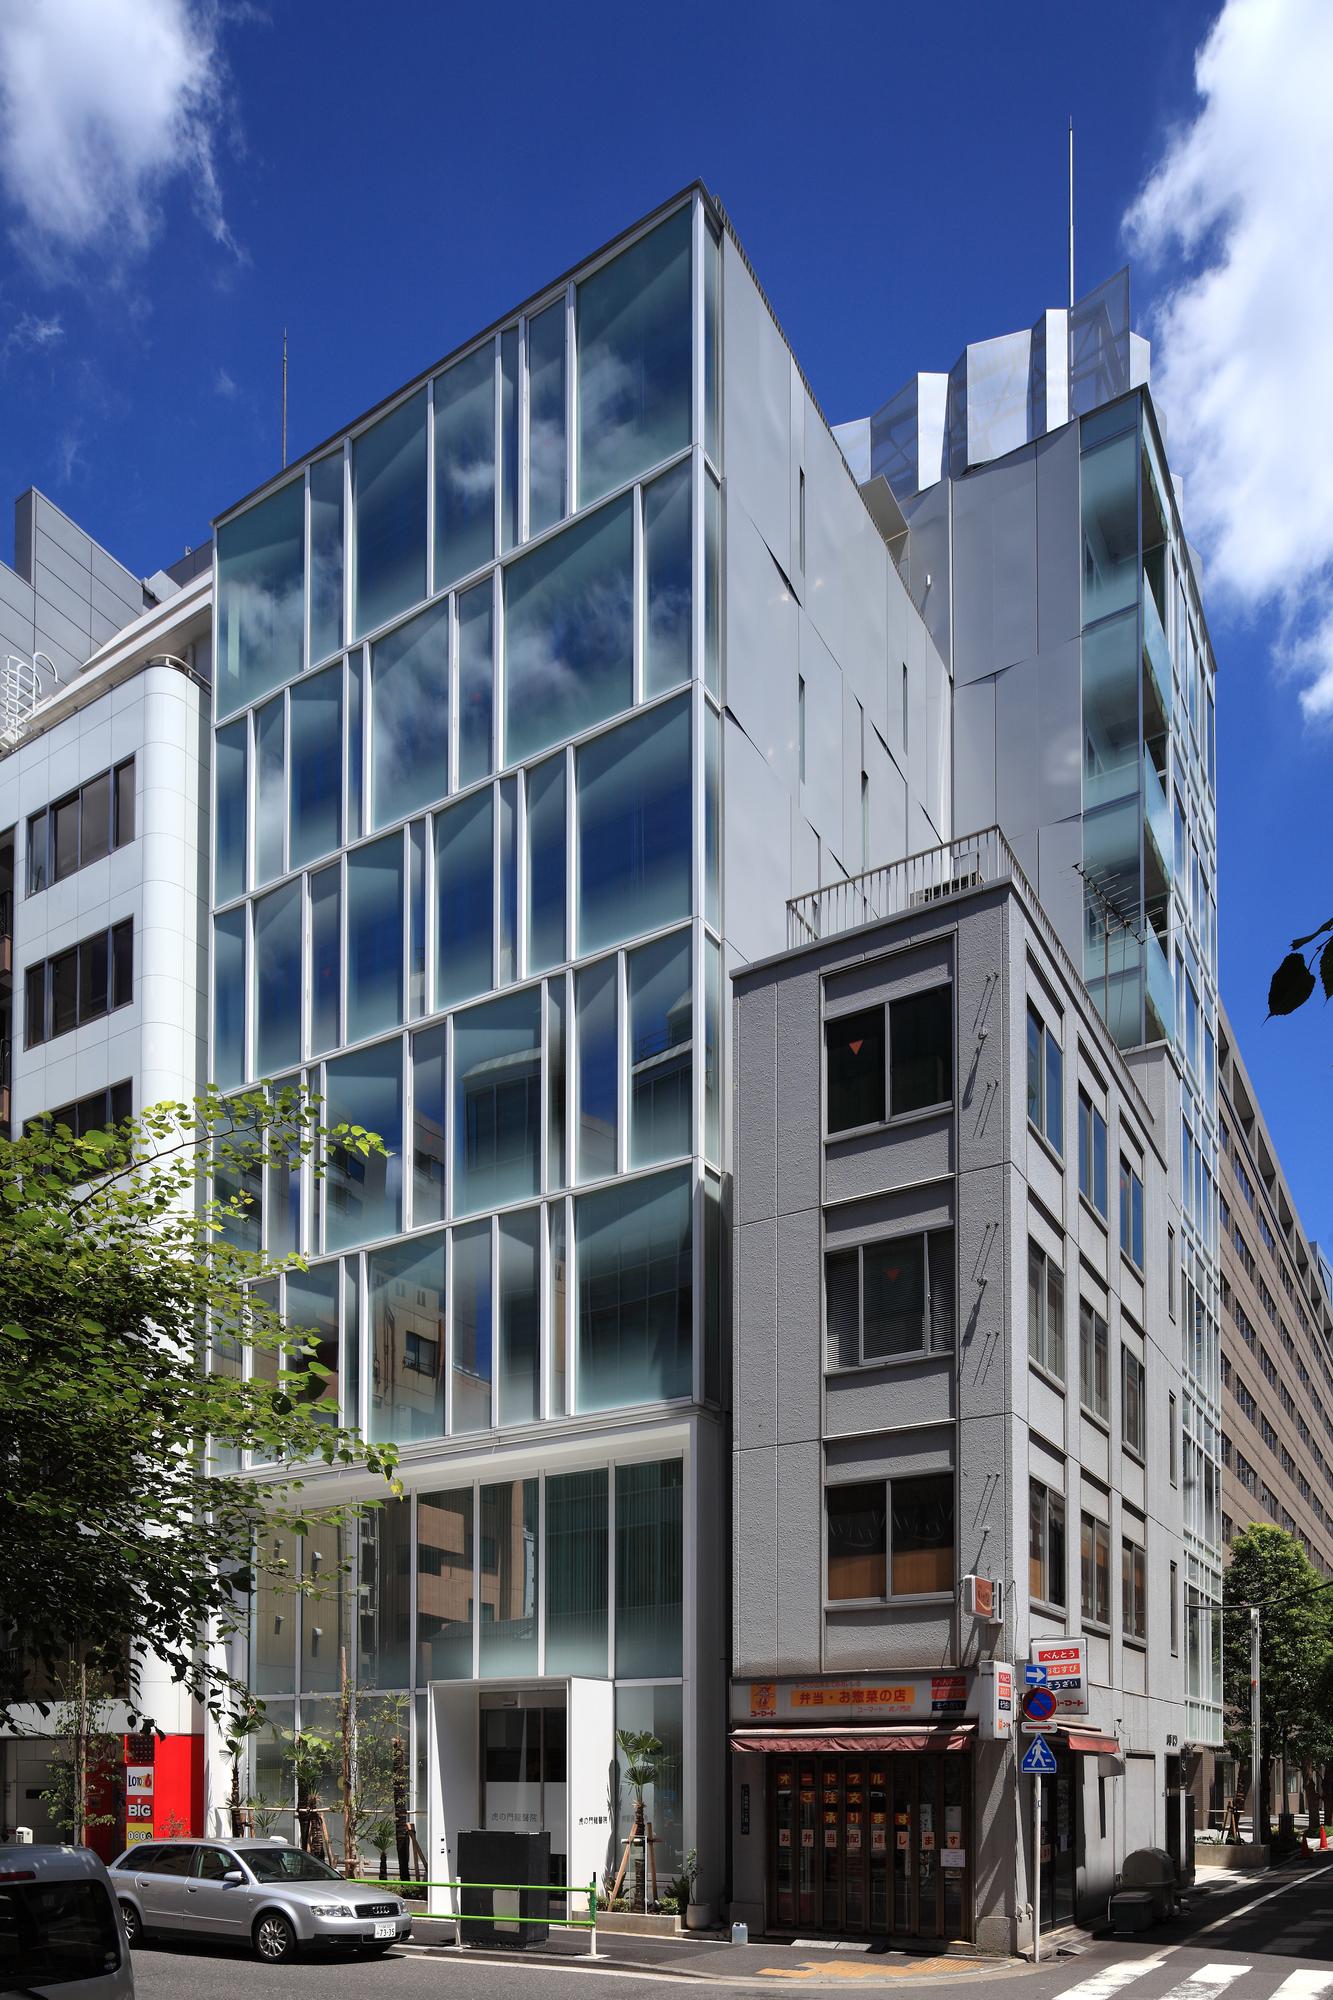 Gallery of t s r building jun ichi ito architect for Architect associates